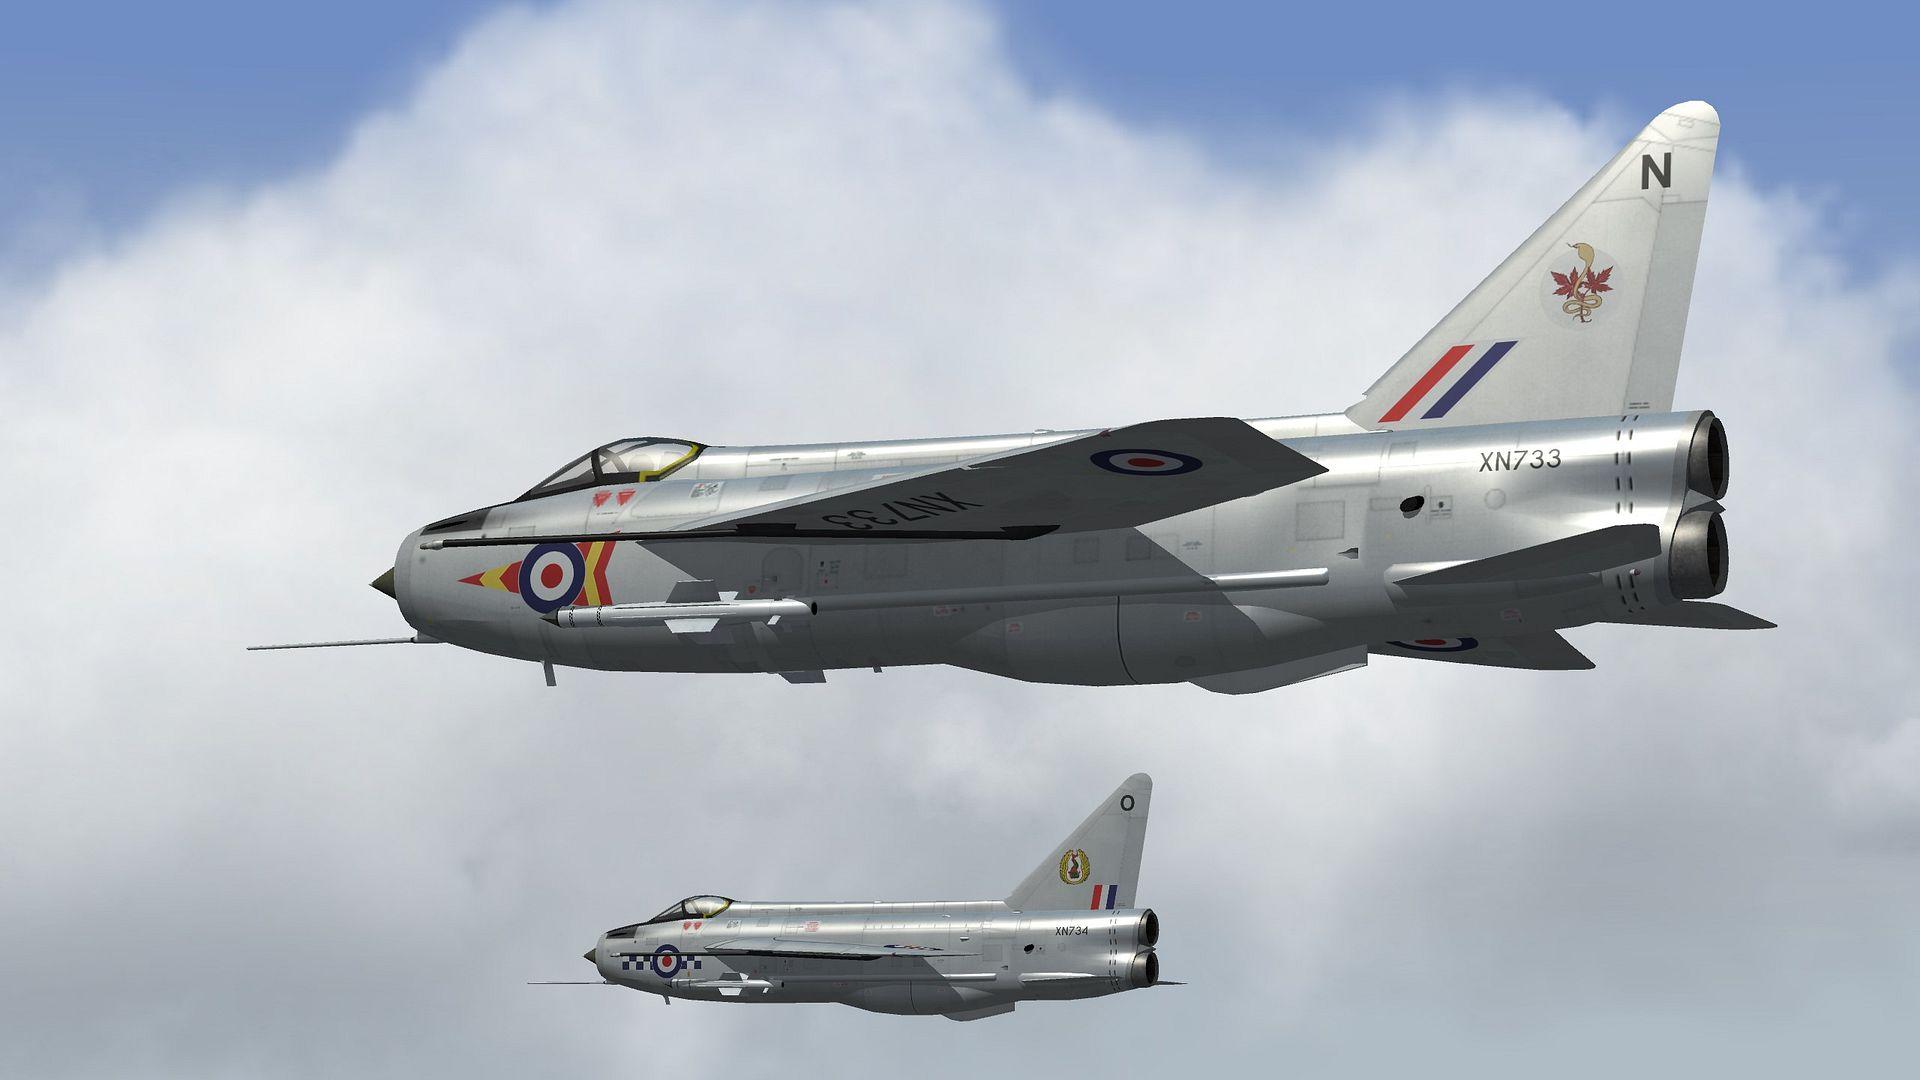 RAF%20LIGHTNING%20F2.01_zpsl6ome5va.jpg